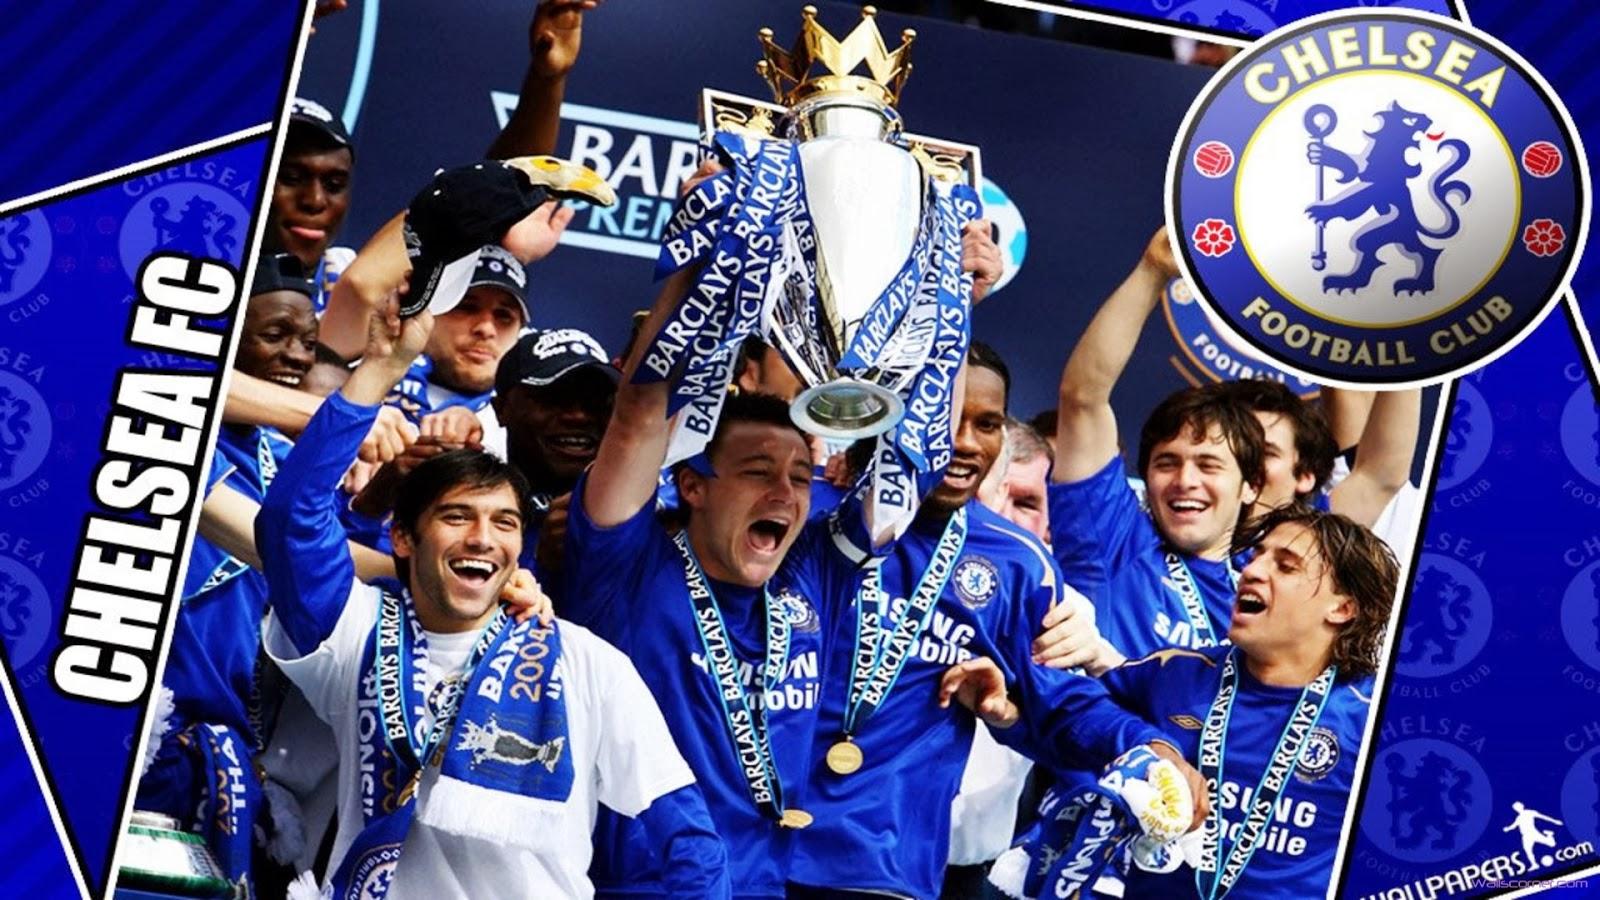 47 Best Chelsea Fc Images On Pinterest: FC Chelsea 1080p HD Wallpapers